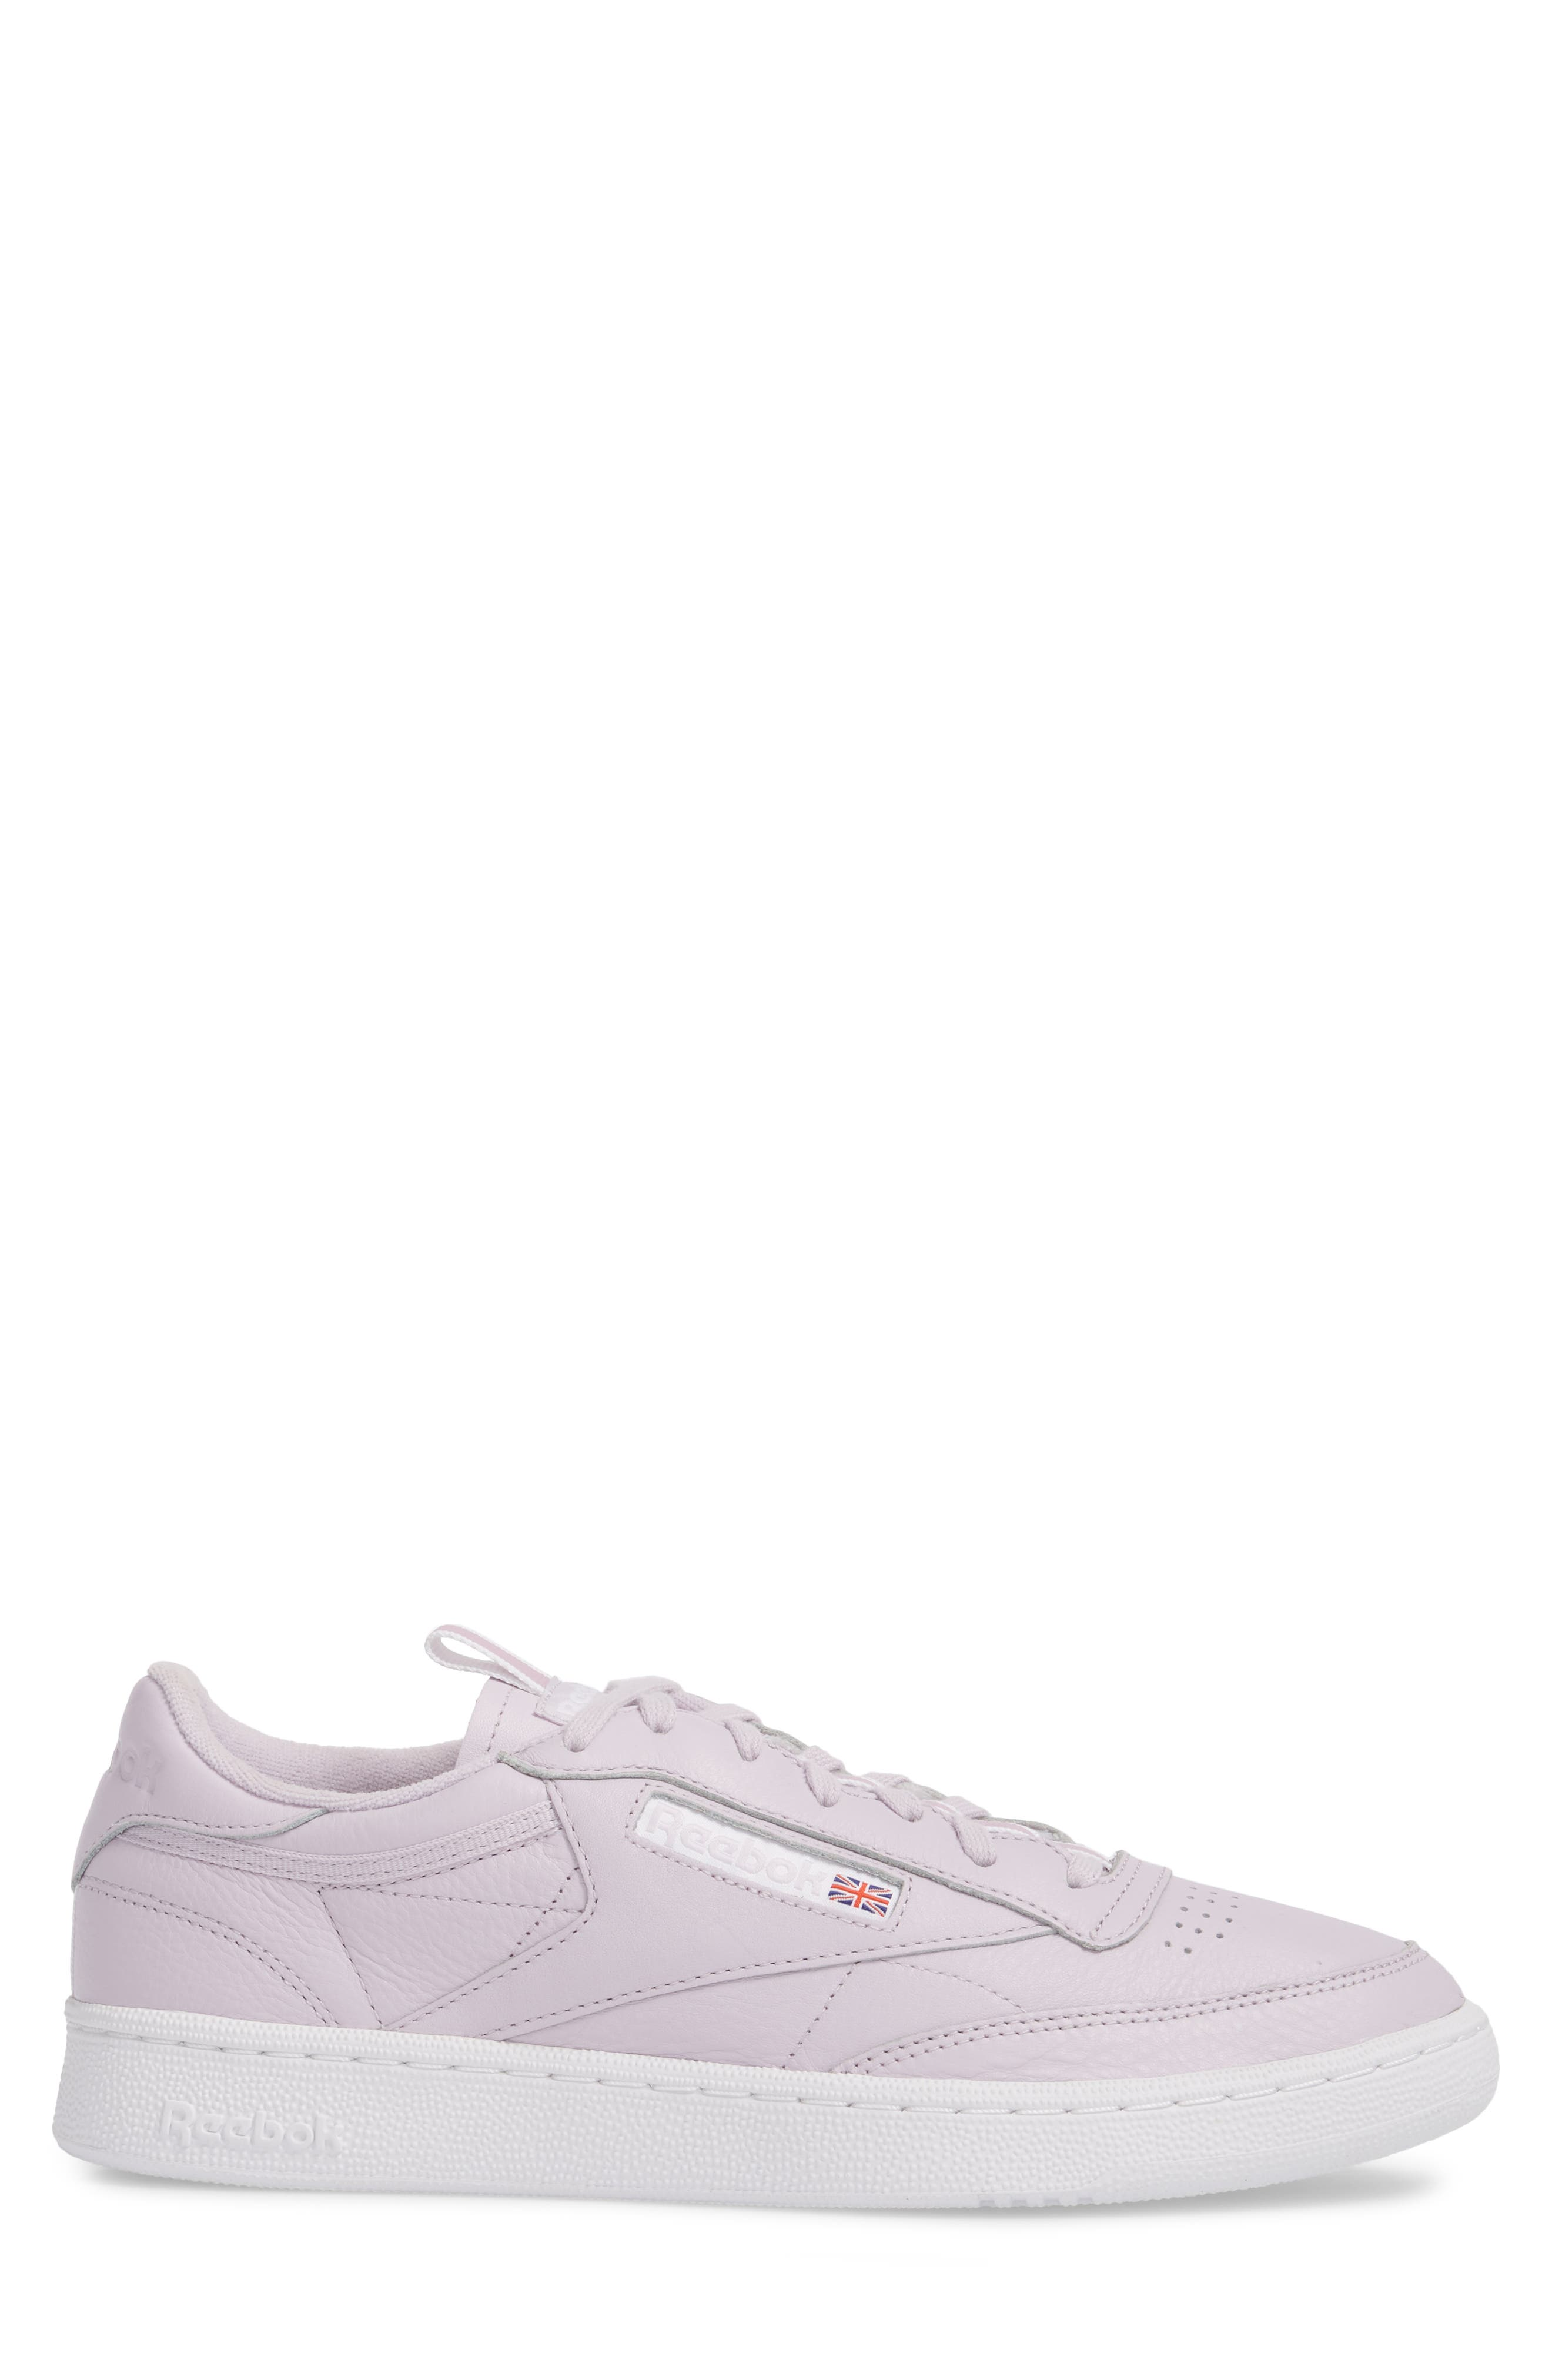 Club C 85 RT Sneaker,                             Alternate thumbnail 3, color,                             Quartz/ White/ Purple Fog